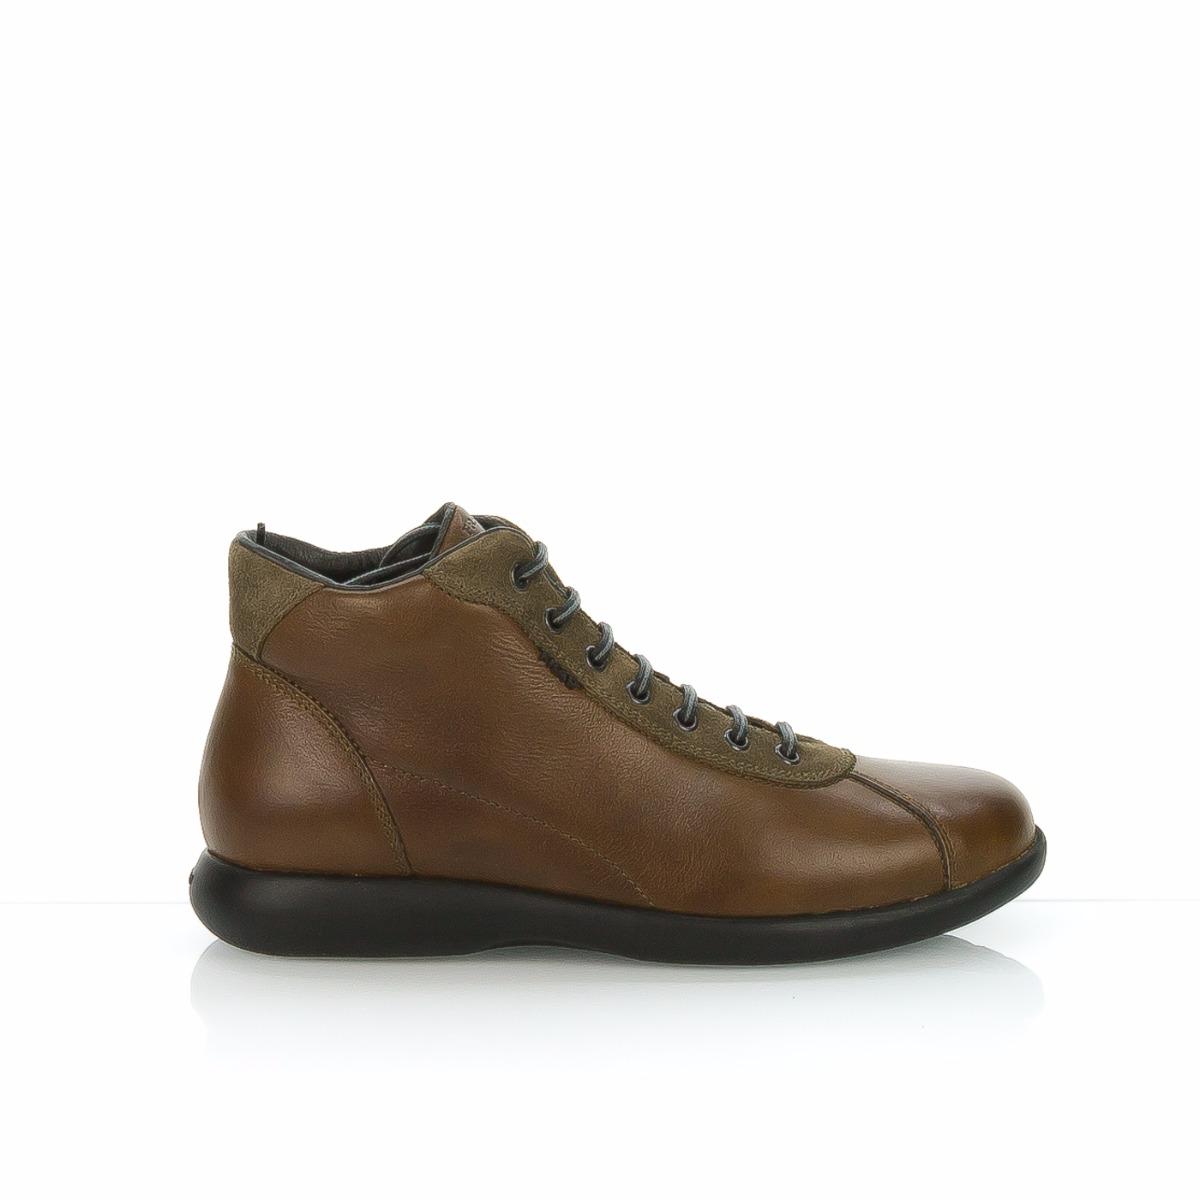 alta Shoe 12543 27P8 Sneakers in Spedizione online Shop da gratuita Center pelle FRAU marrone uomo g4xTdxwOq